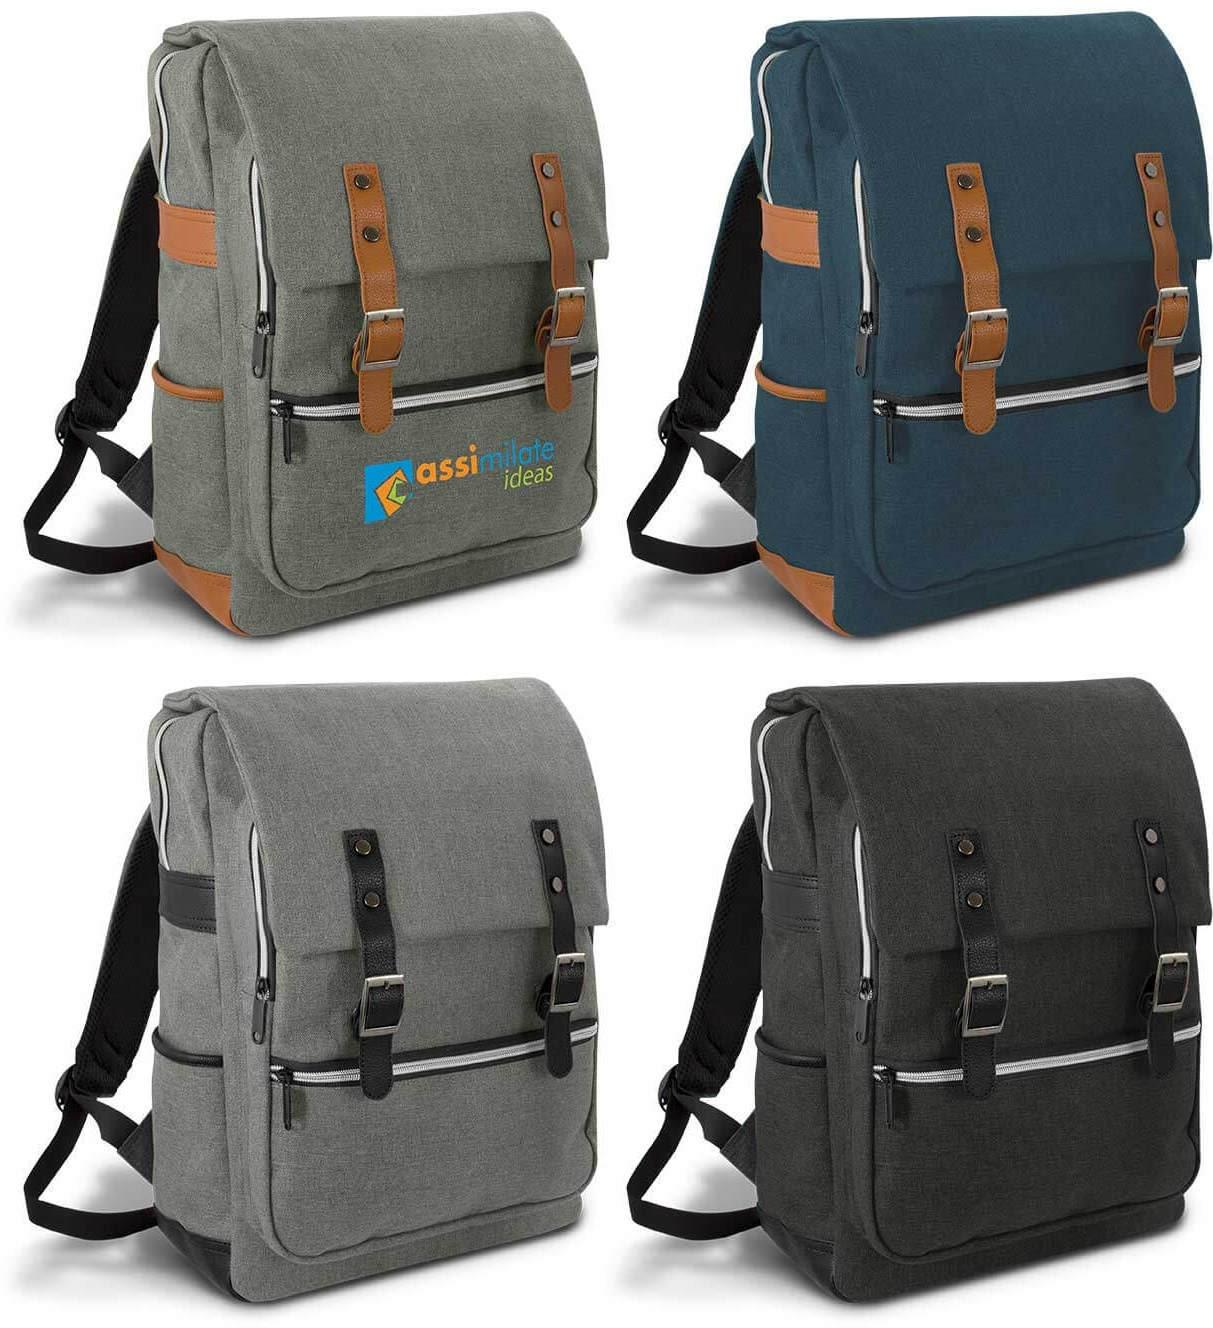 Cobain Laptop Backpack